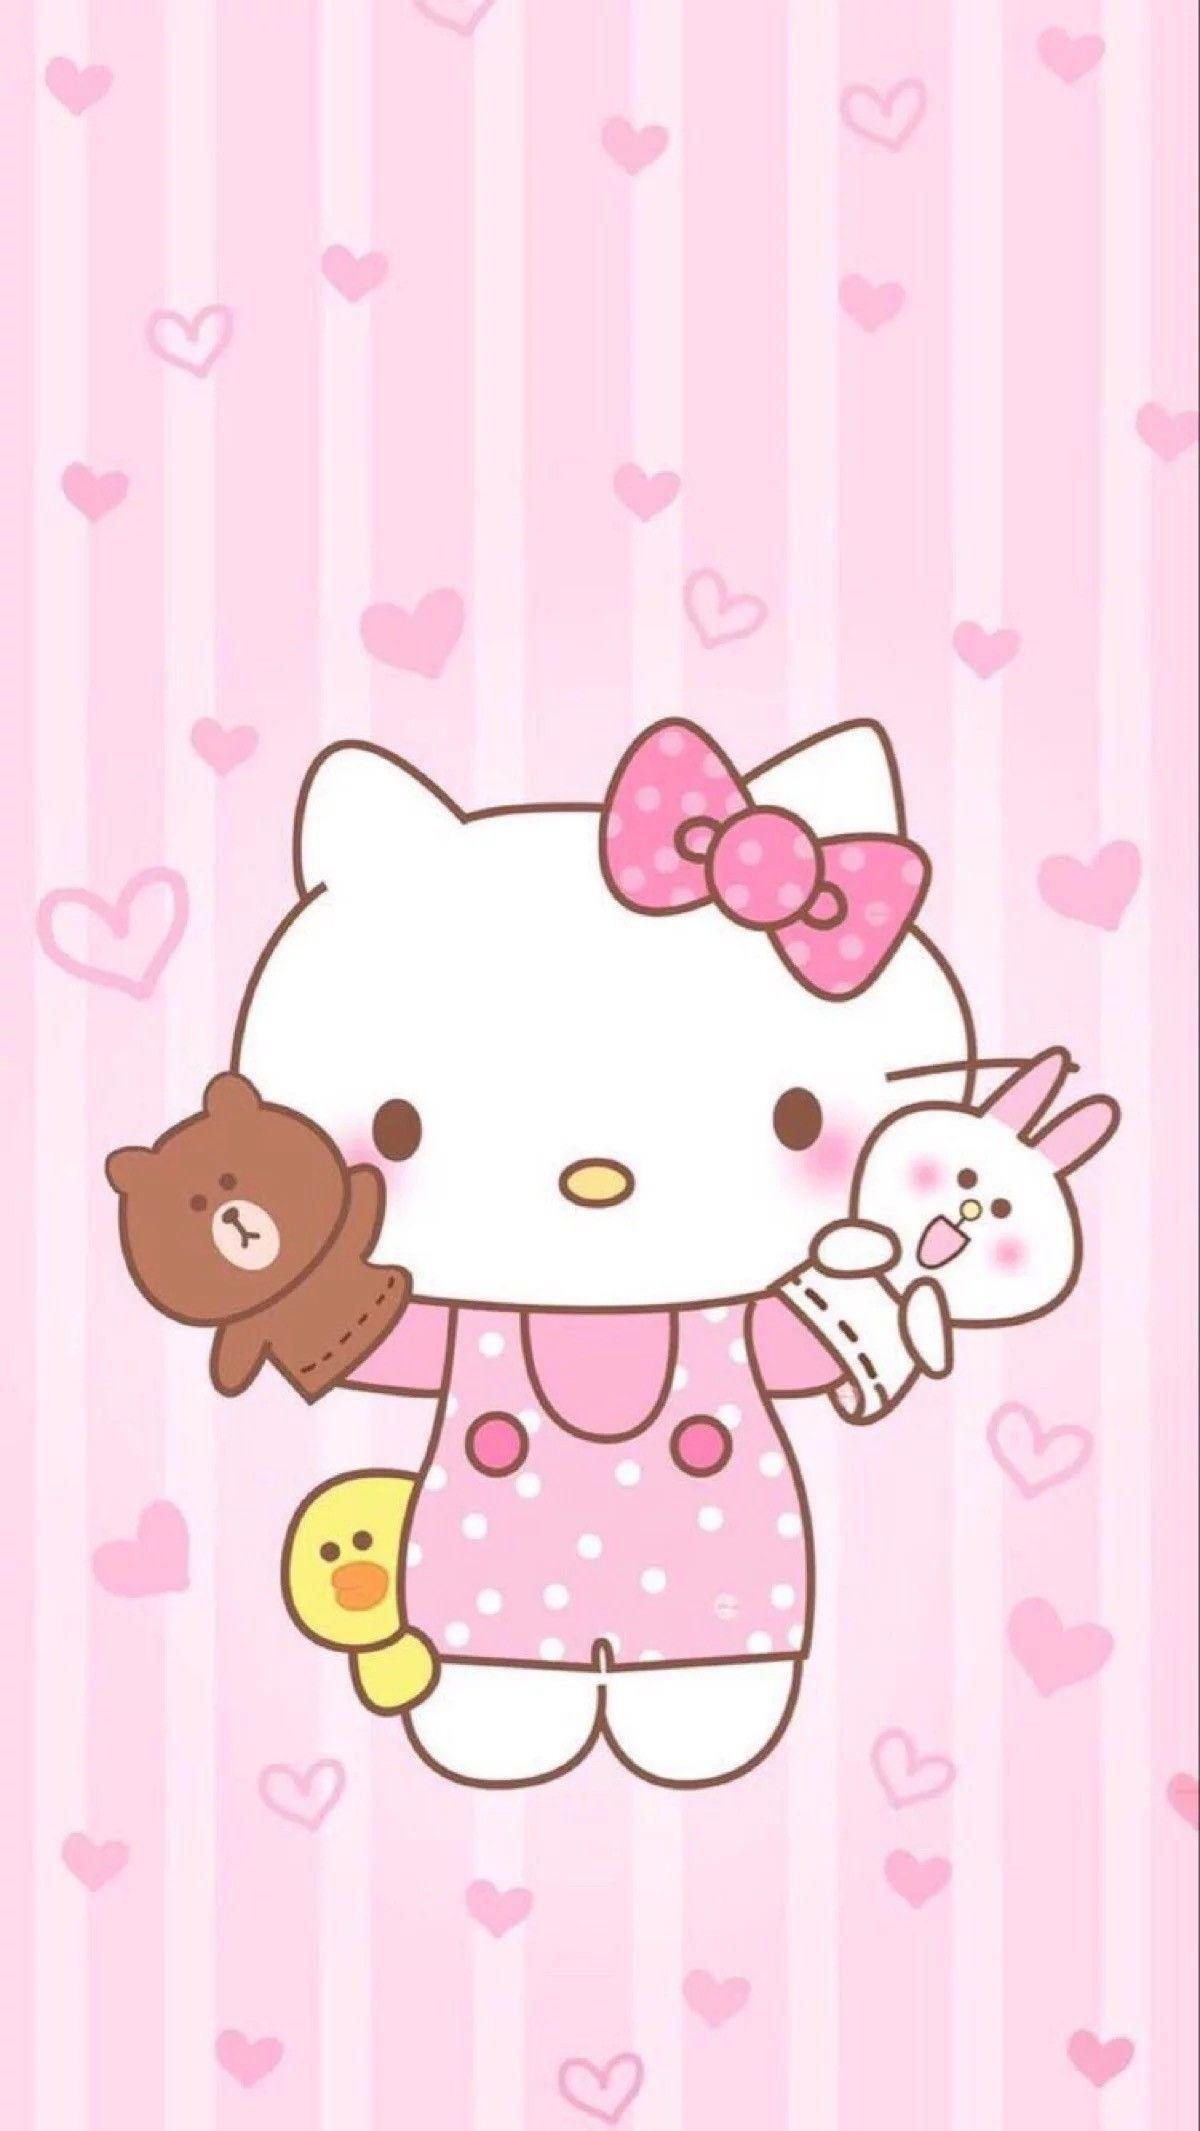 Hello Kitty chơi rối tay